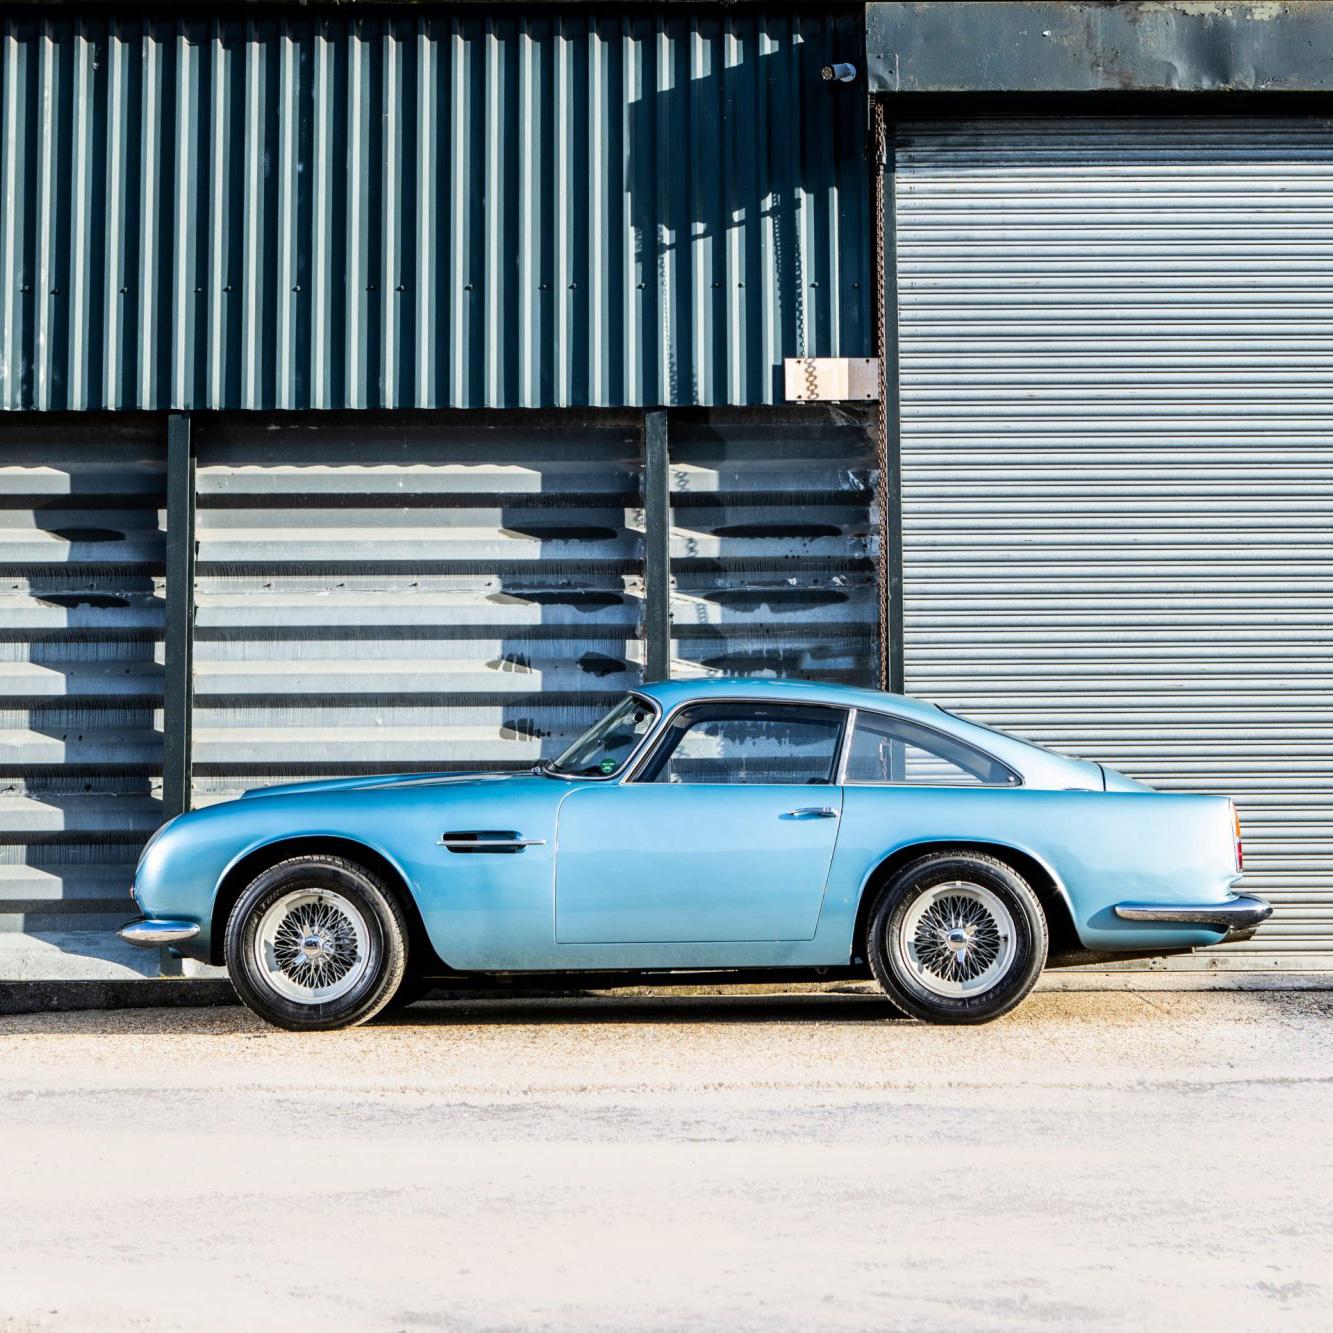 Aston Martin DB4GT 'Lightweight'